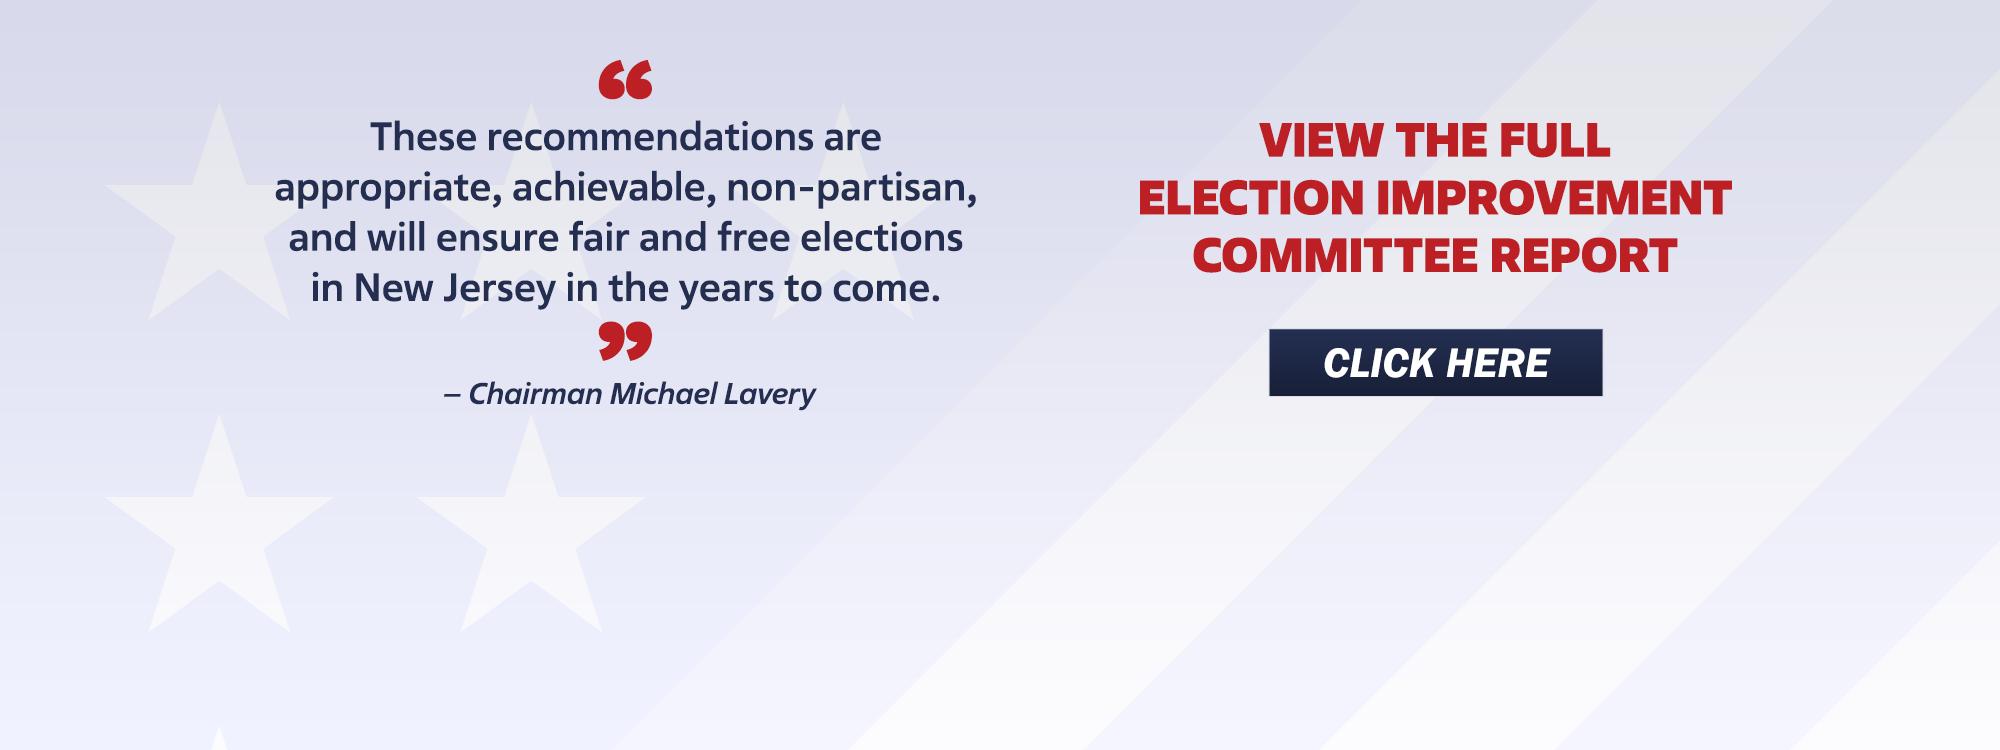 Election Improvement Committee Report